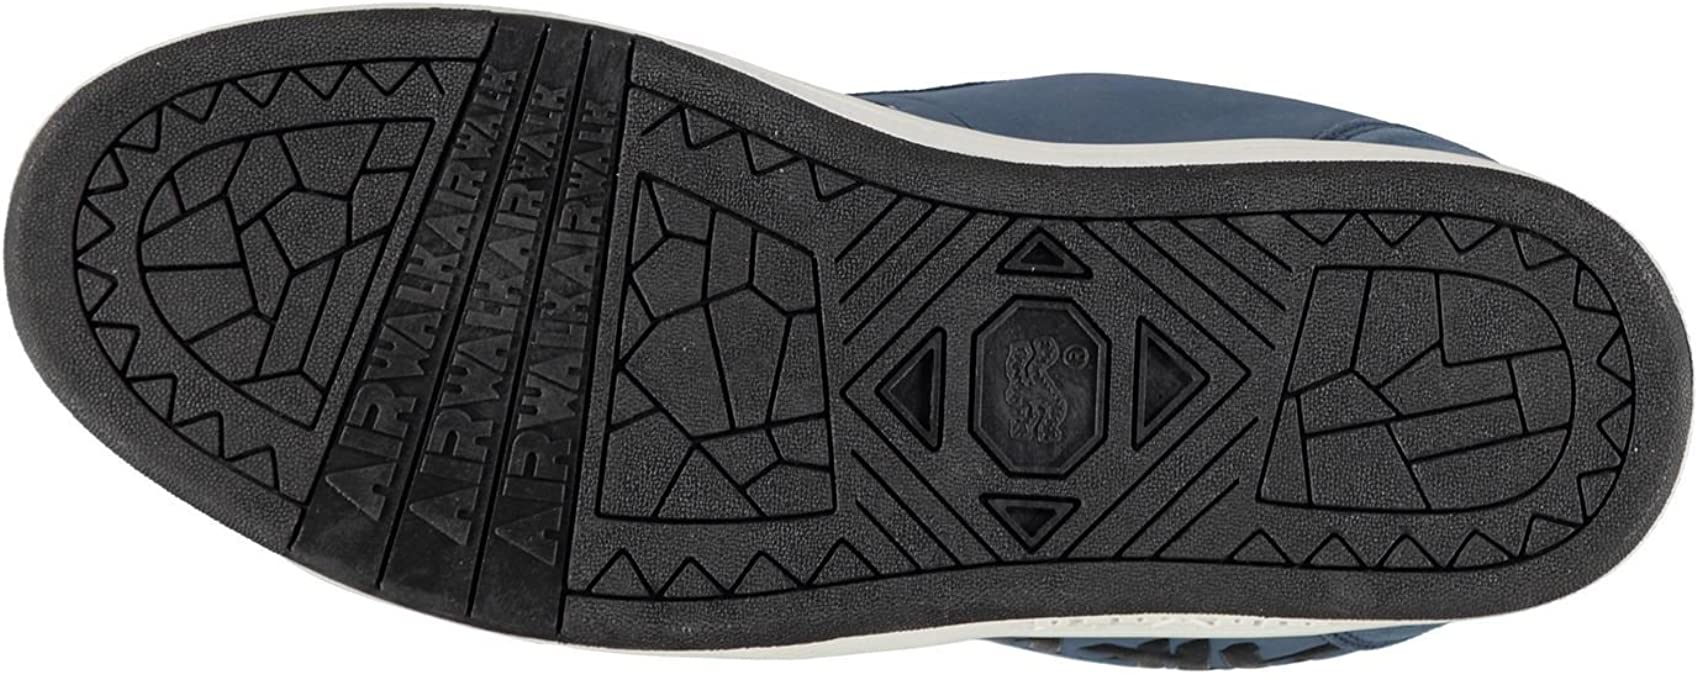 Airwalk Neptune Chaussures de Skate Homme Bleu Marine d/écontract/é Baskets Sneakers